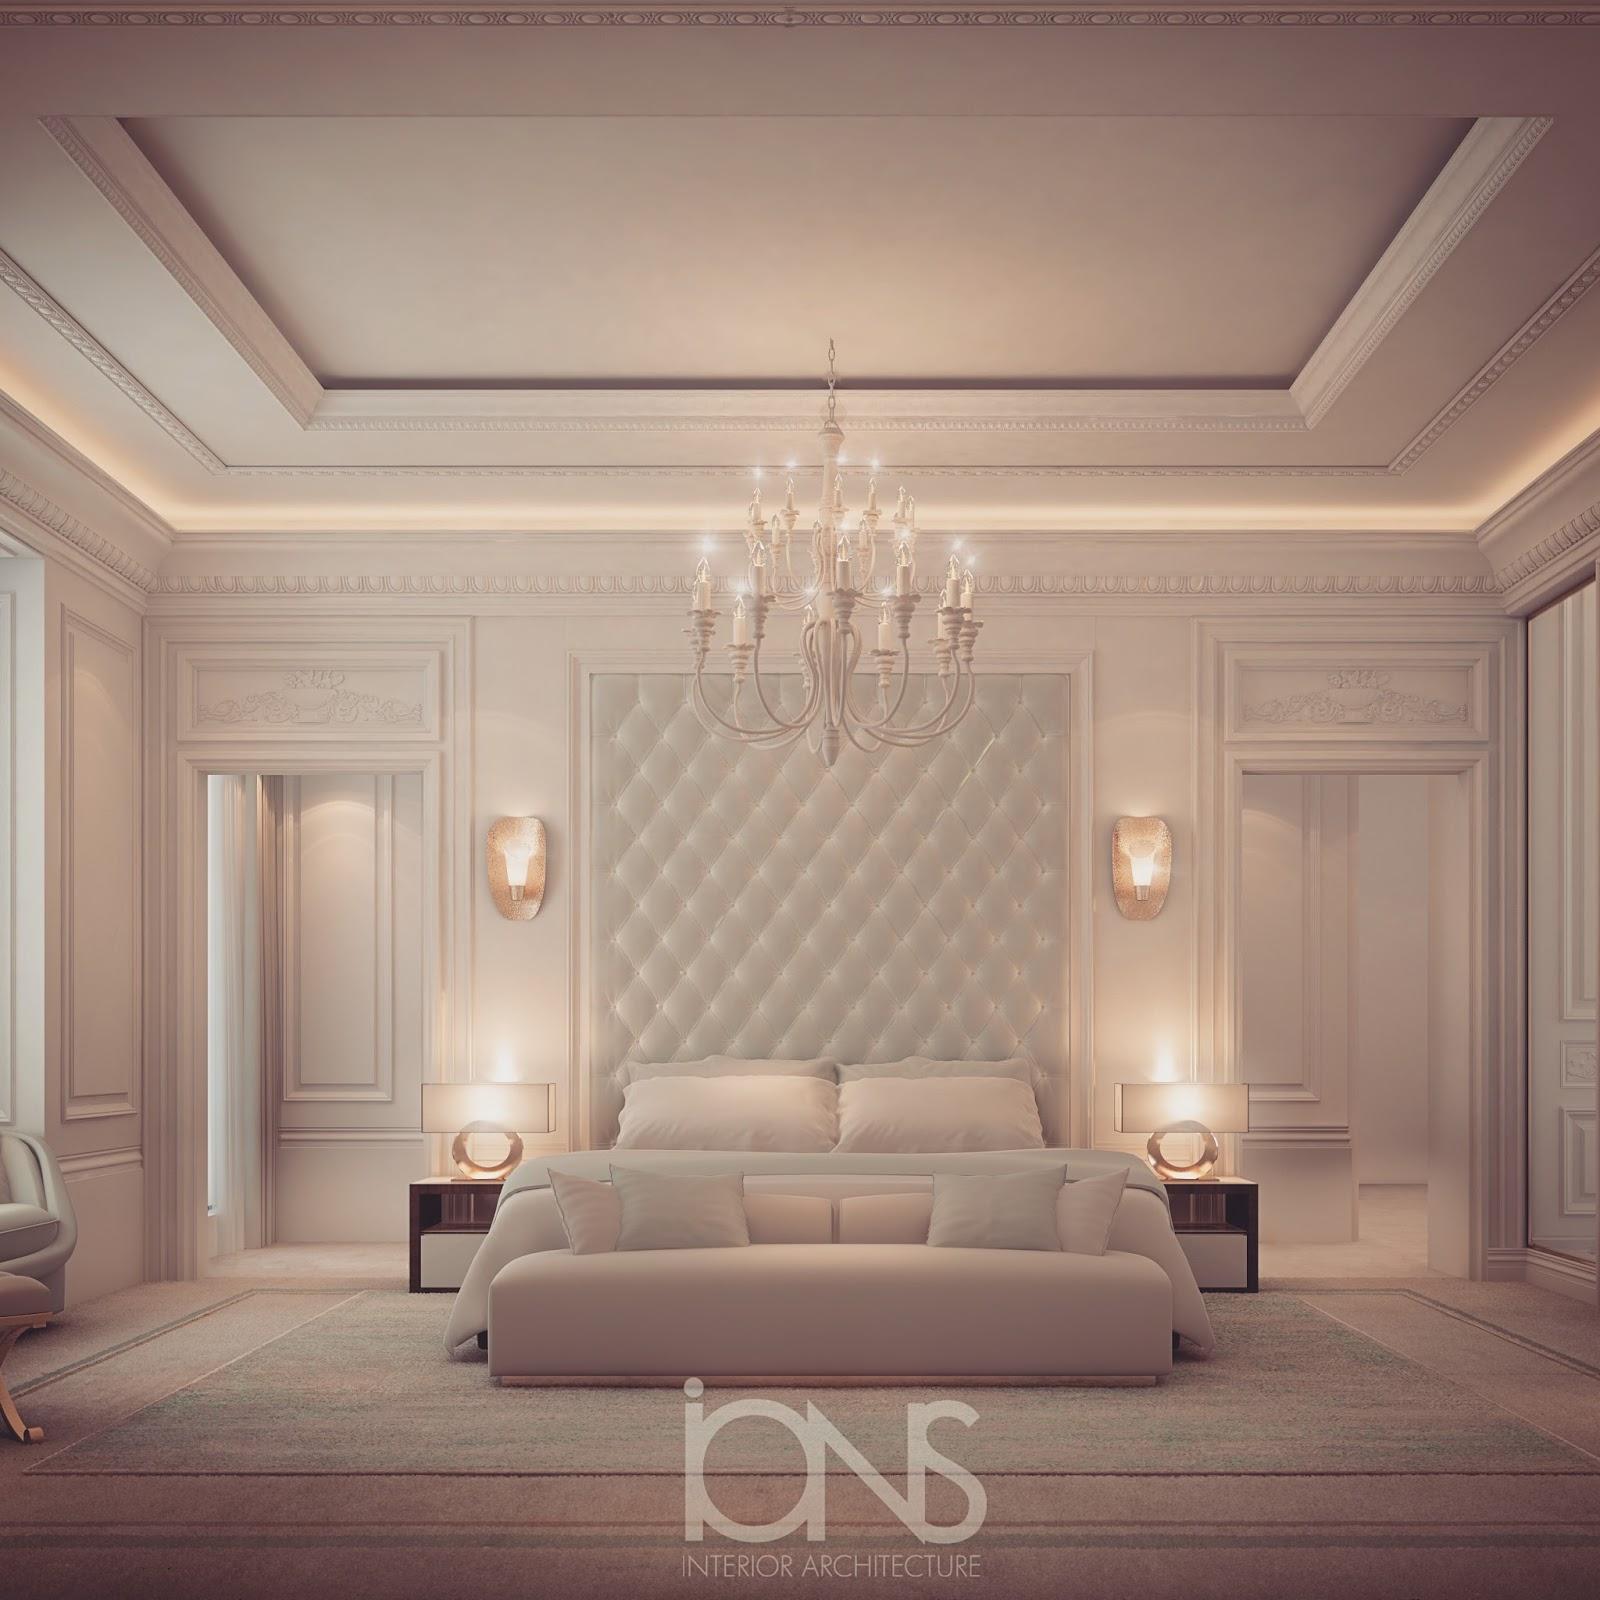 Dubai Interior Design Company Interior Design Ideas For Luxury House